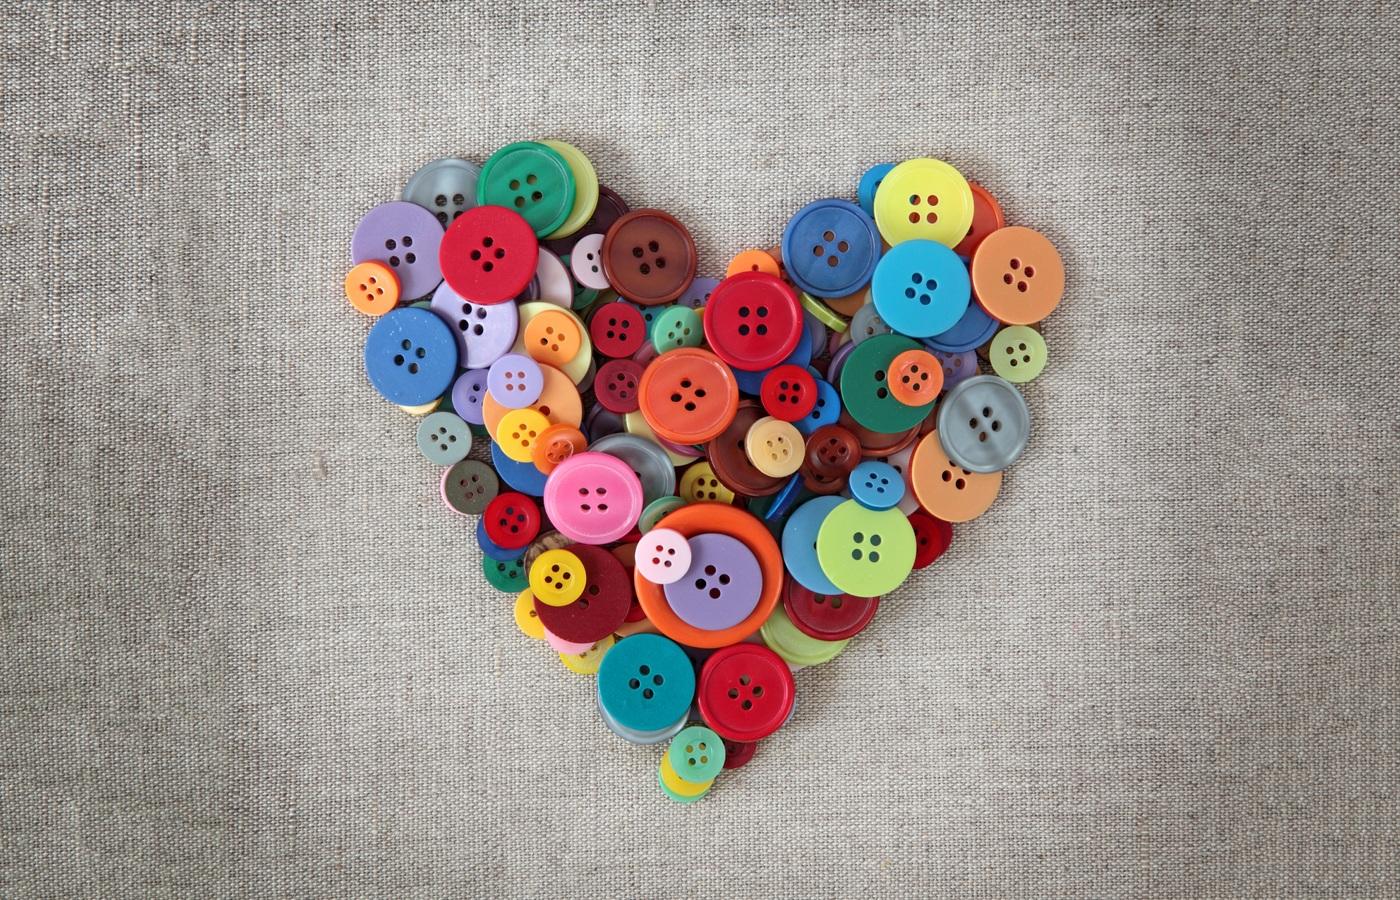 artistic-heart.jpg